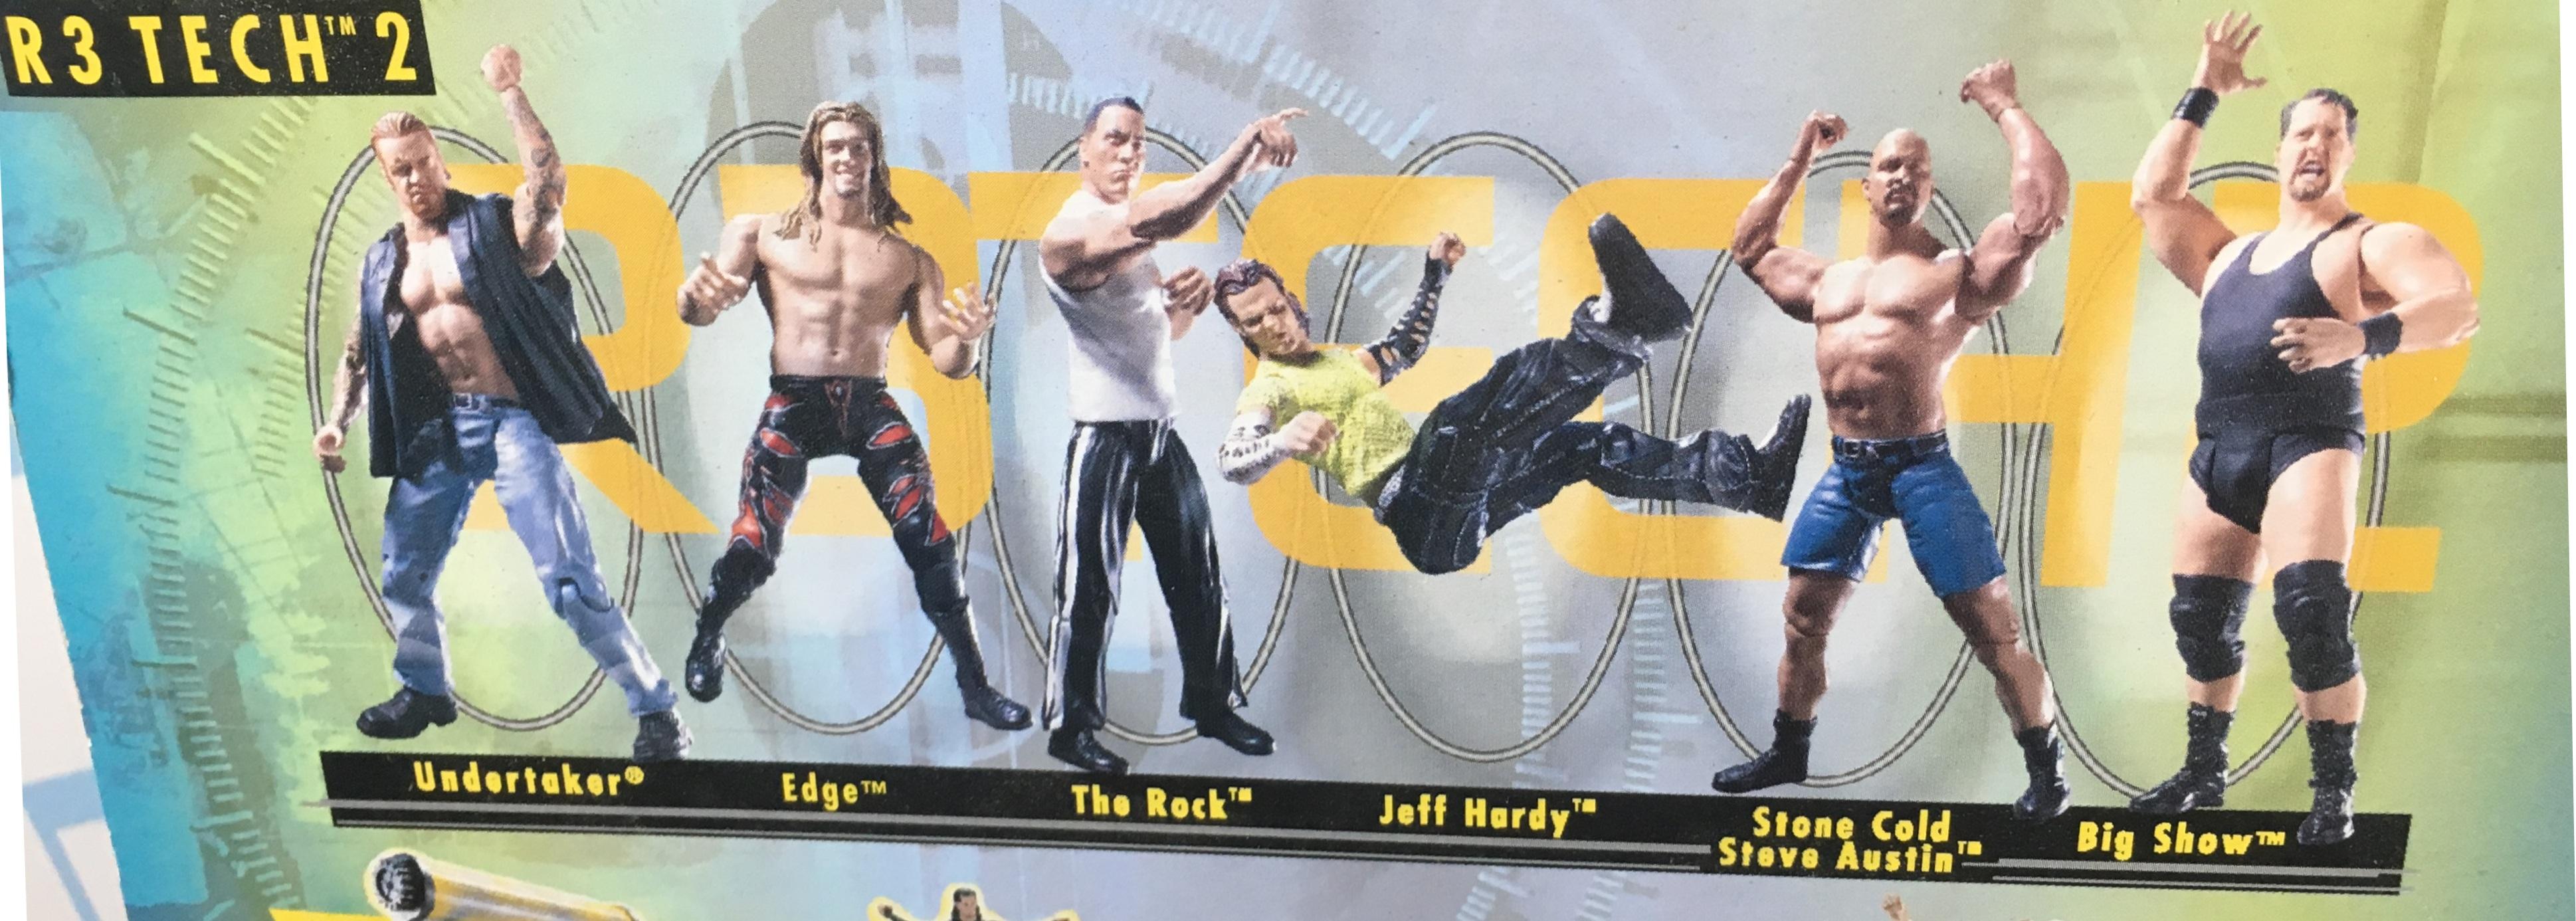 WWF WWE Wrestling Jakks R3 Tech Series 2 Jeff Hardy Big Show Stone Cold Steve Austin Edge The Rock The Undertaker